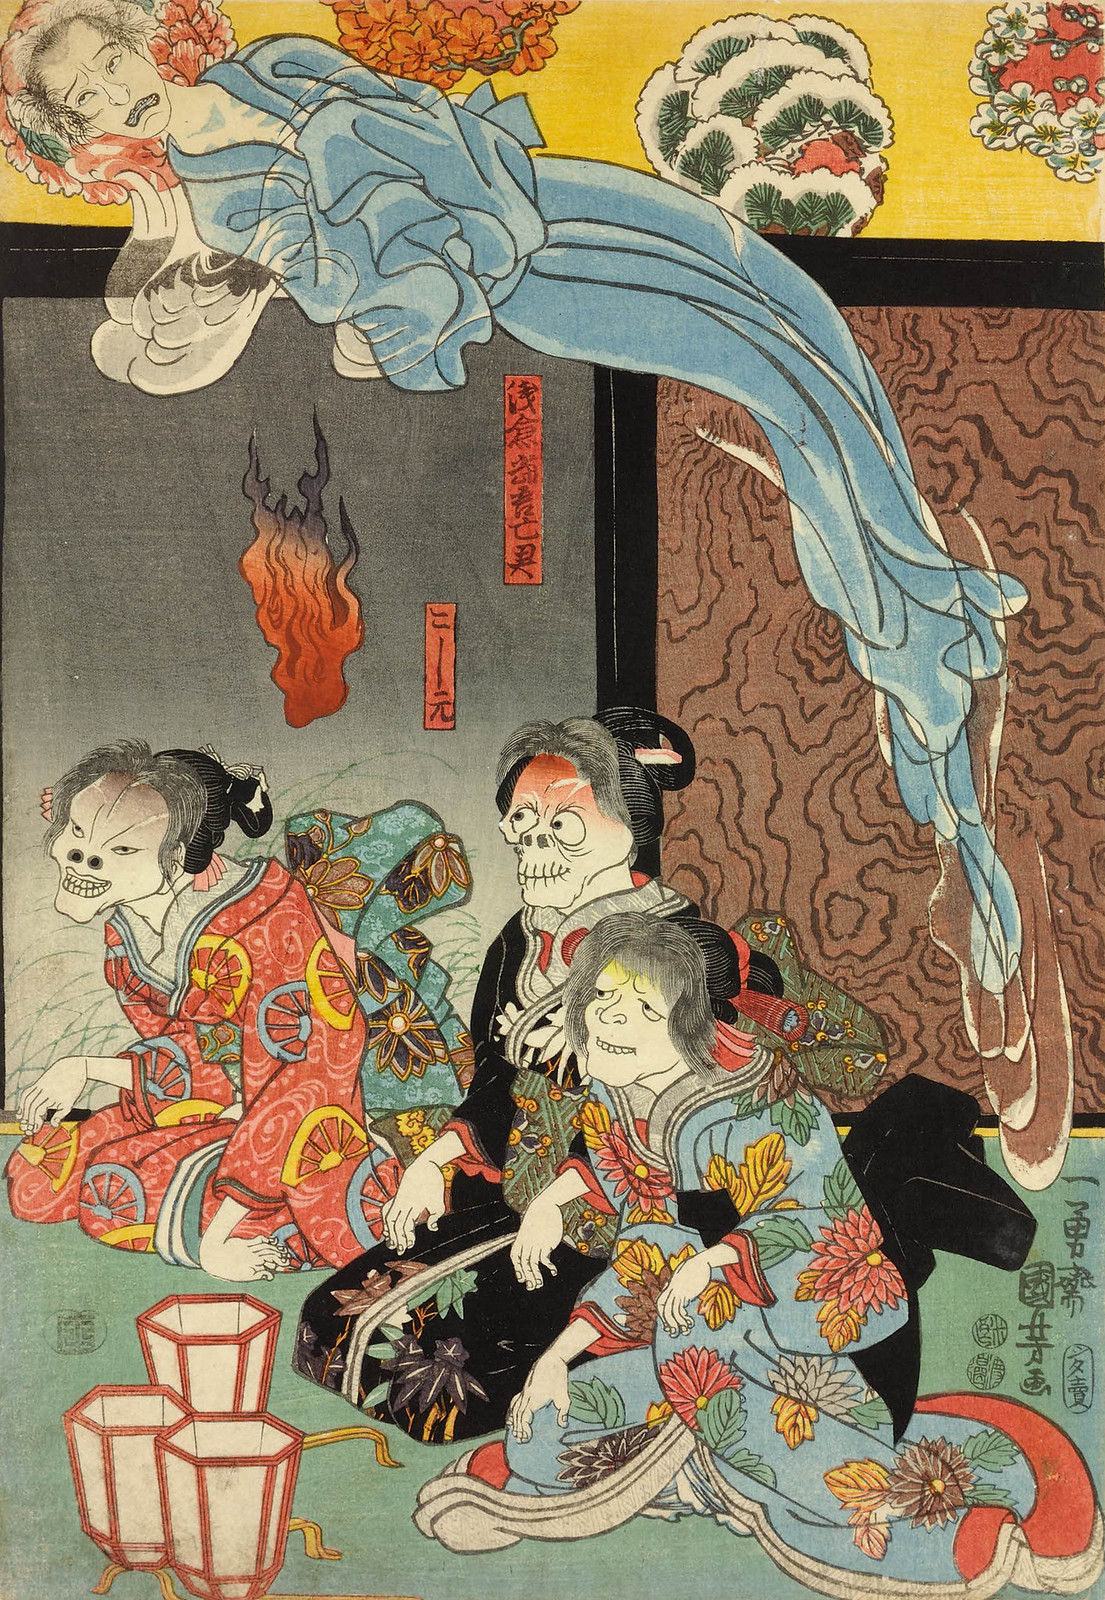 Utagawa Kuniyoshi - Orikoshi Masatomo (centre) (played by Bando Hikosaburo IV) is attacked by the ghost of Asakura Togo 1853 (right panel)